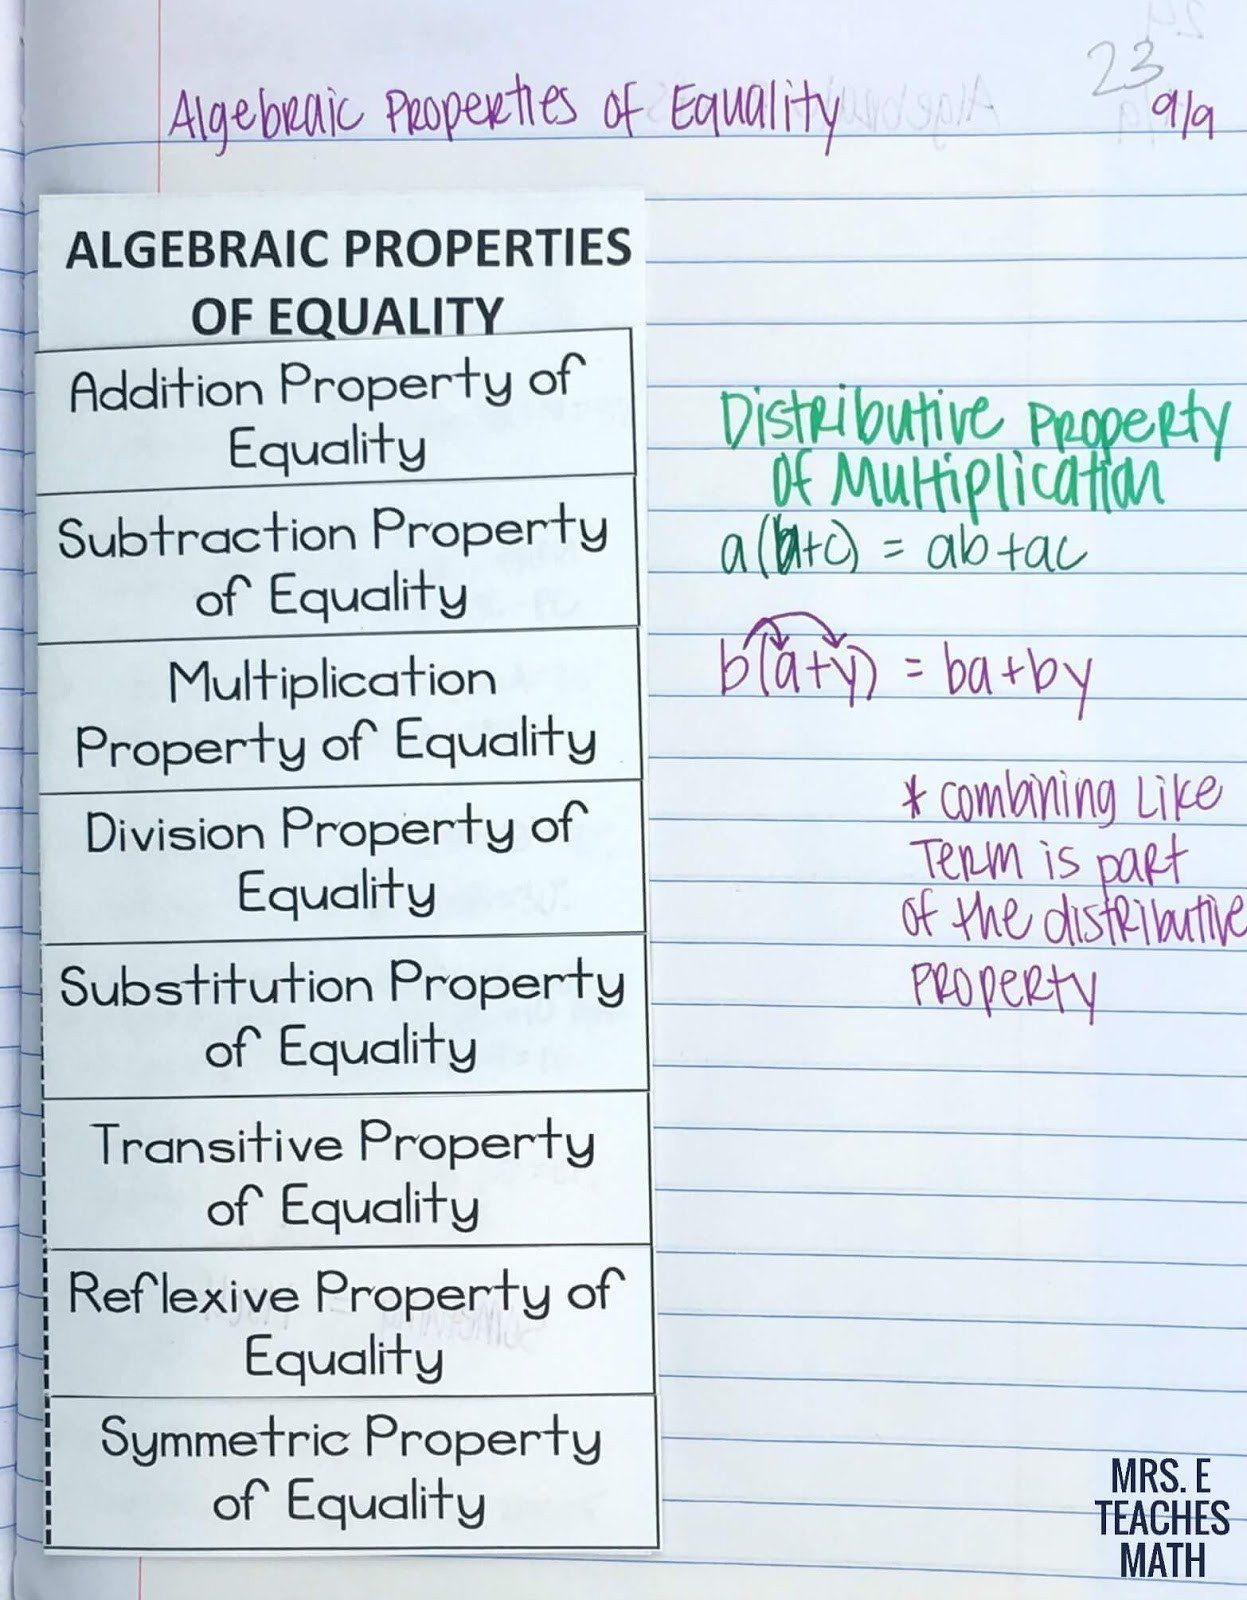 Algebraic Proofs Worksheet With Answers Worksheet Algebraic Proof In 2020 Geometry Worksheets Basic Algebra Algebraic Proof